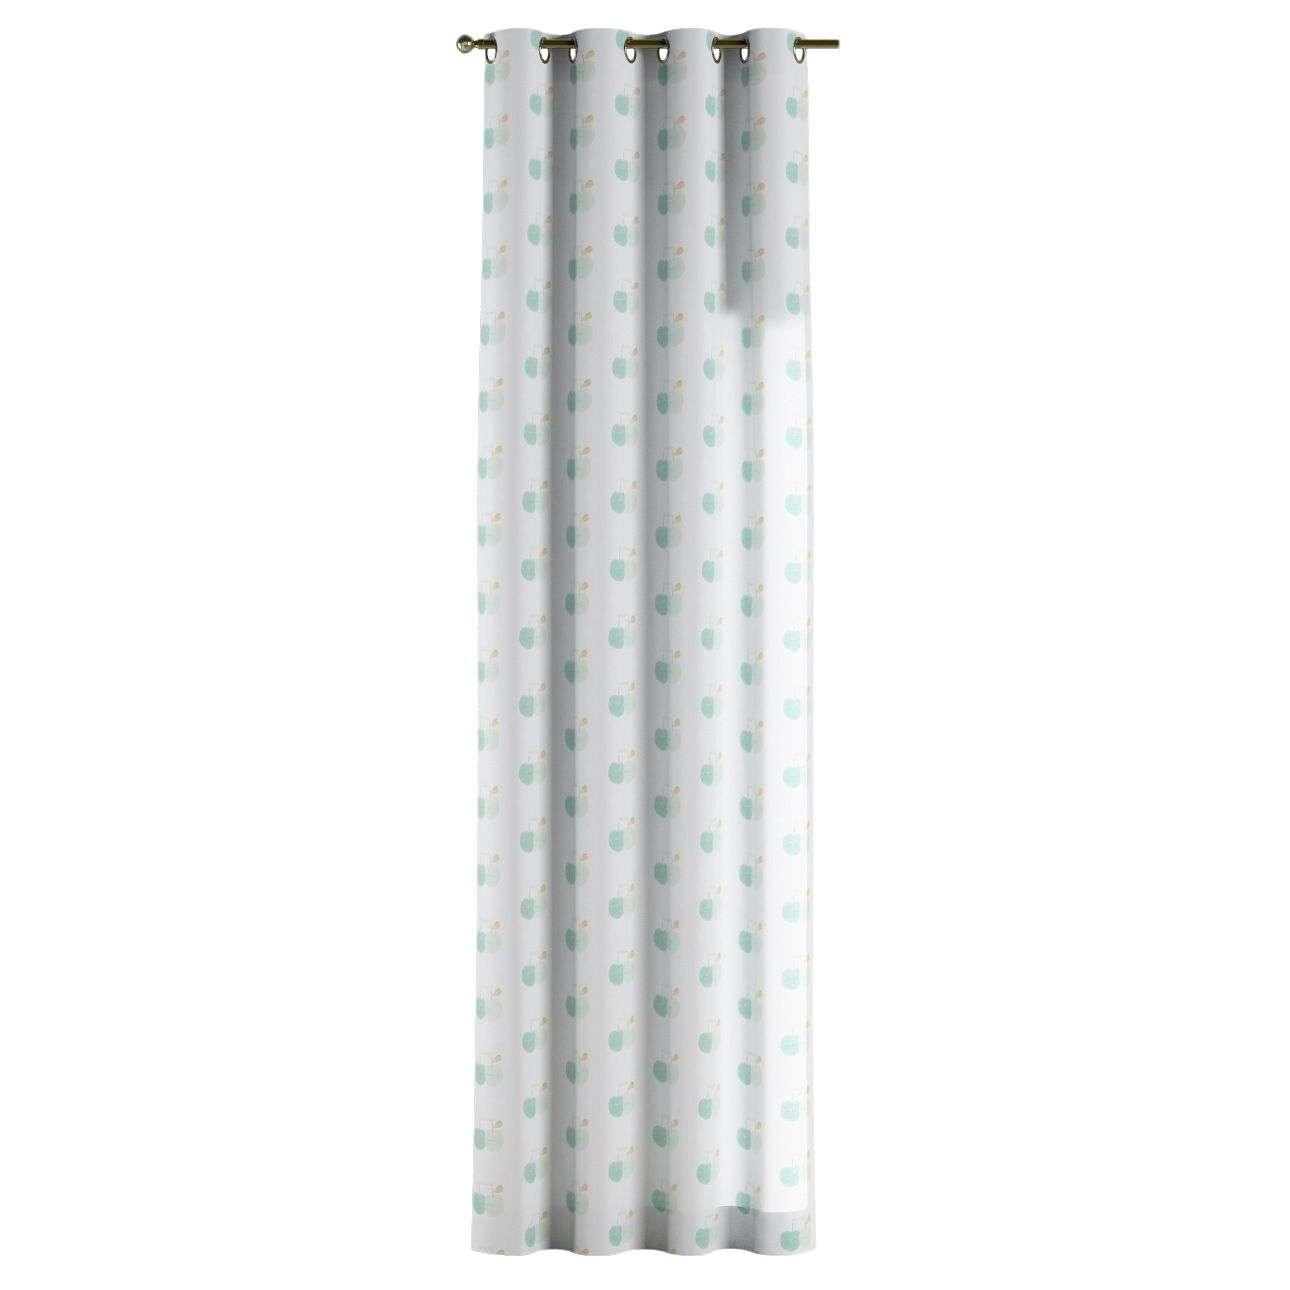 Záves s kolieskami 130 x 260 cm V kolekcii Apanona, tkanina: 151-02